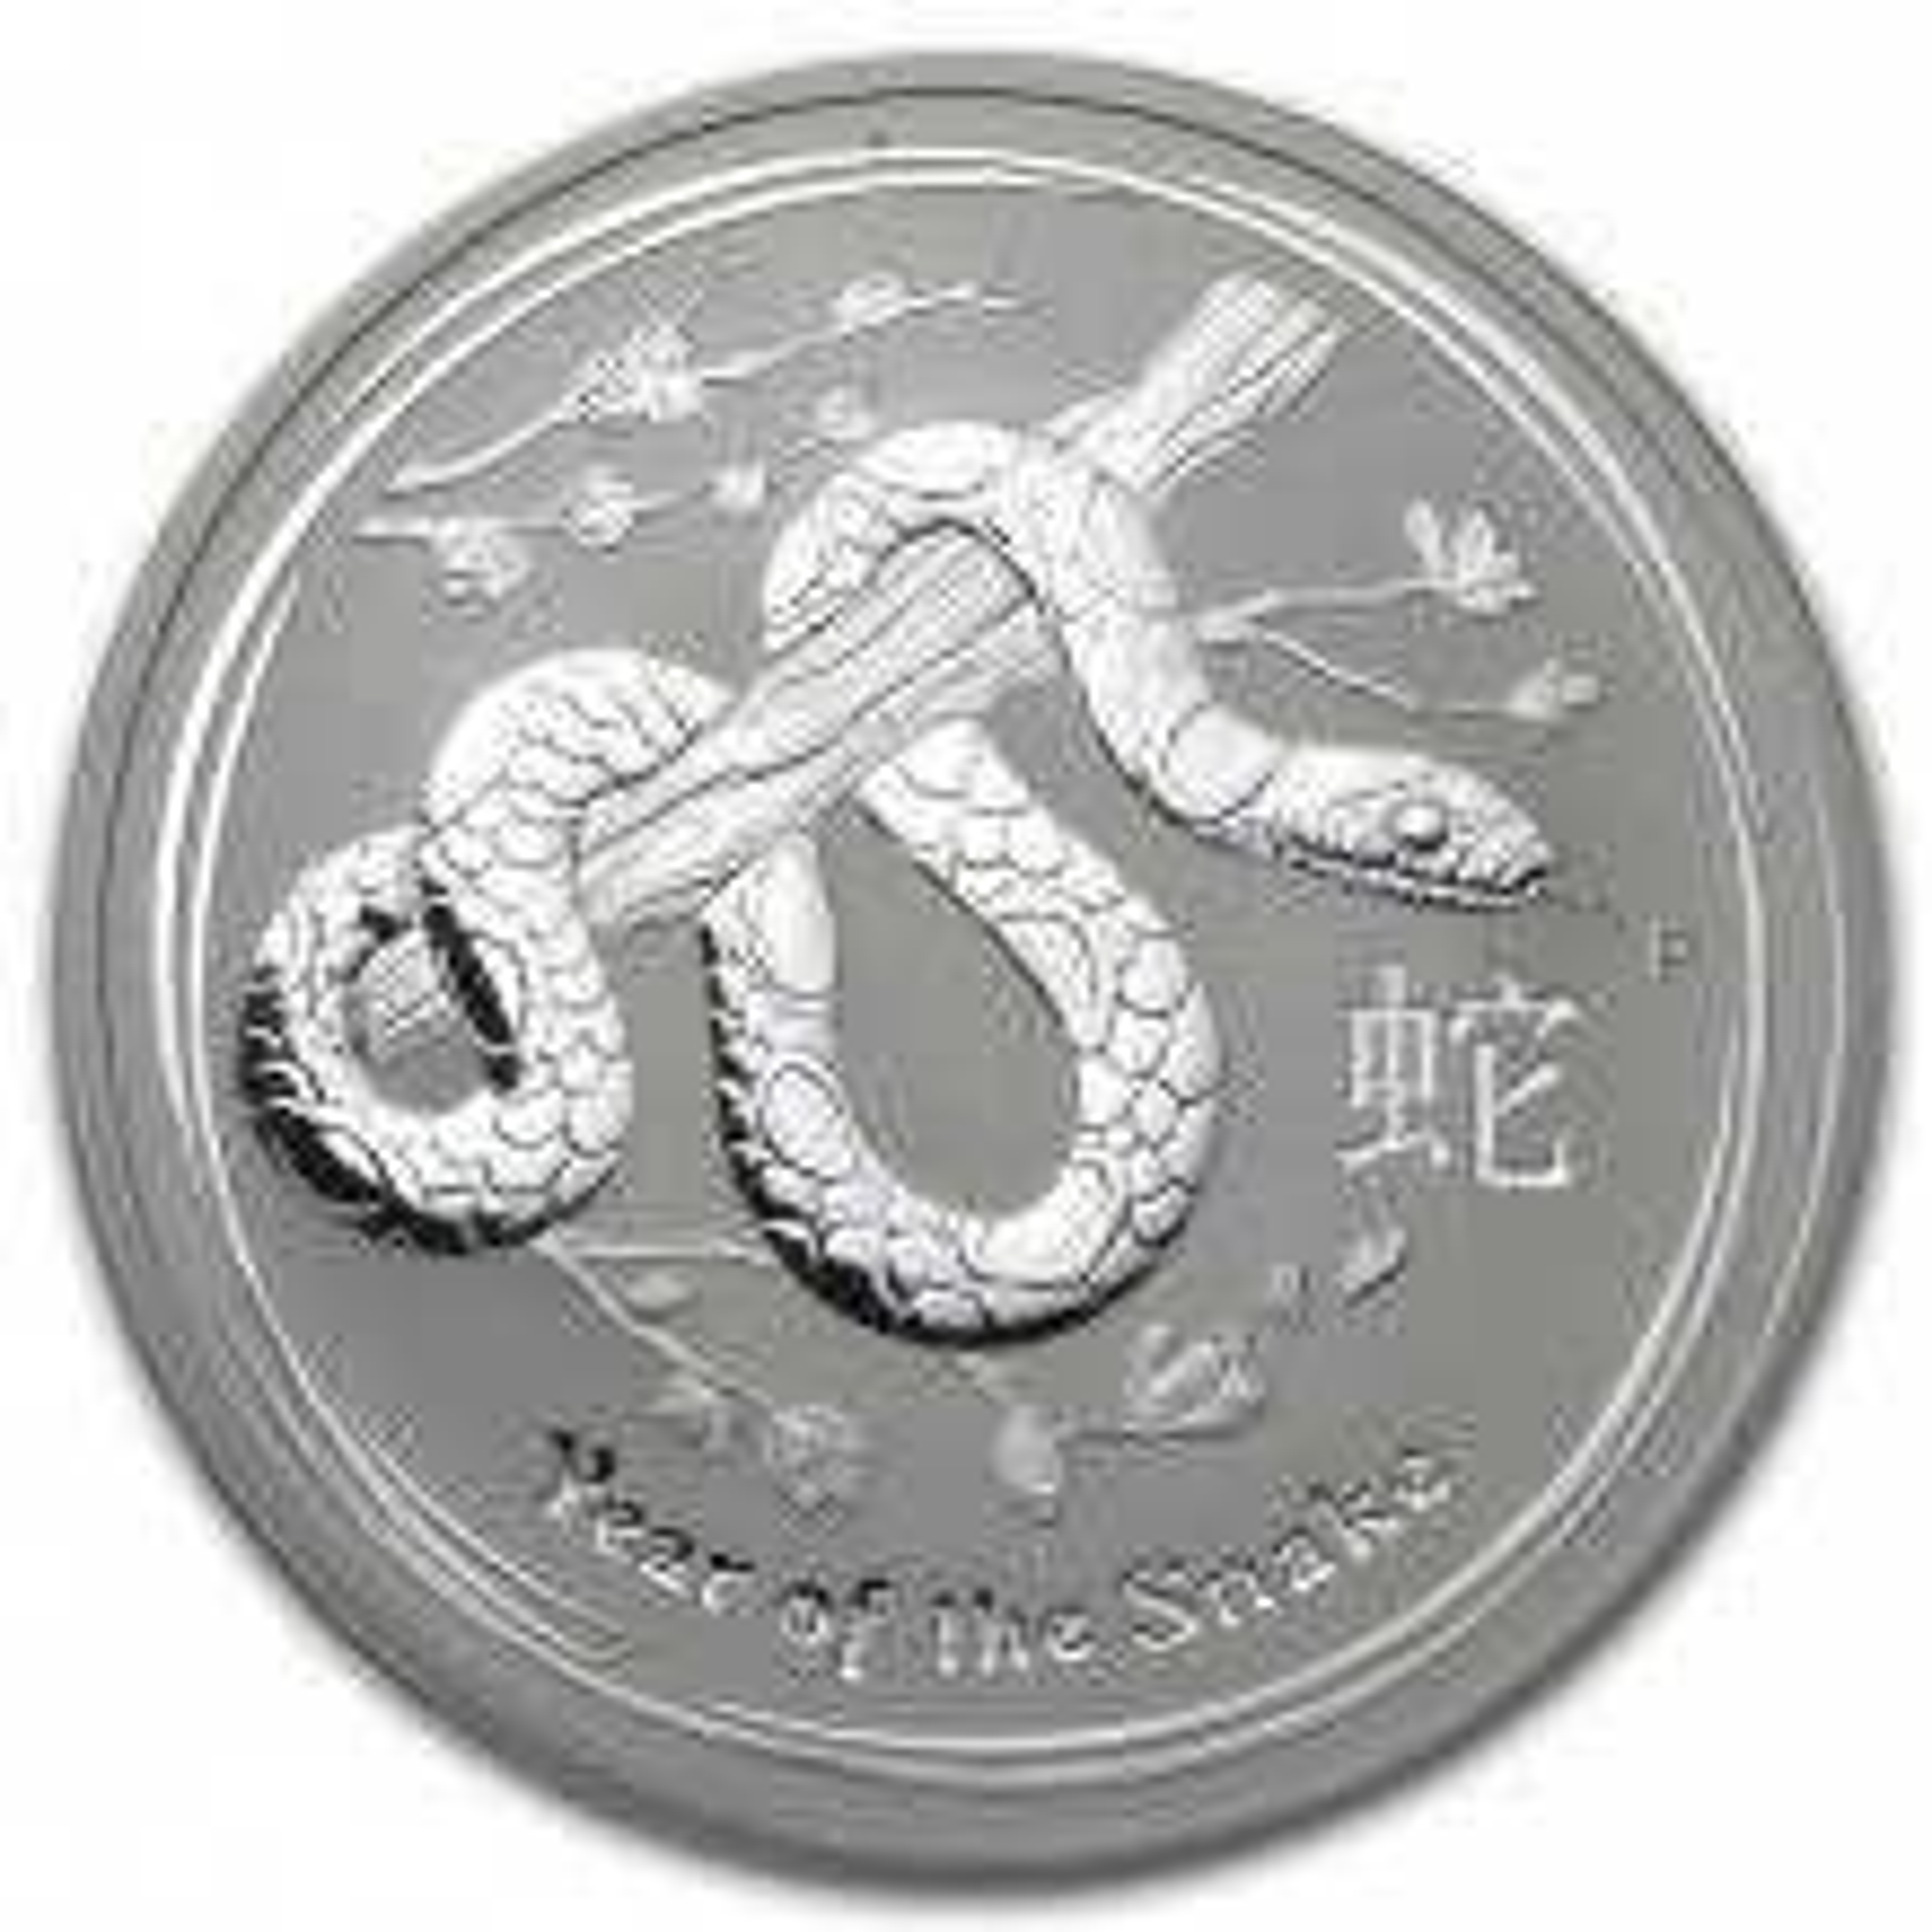 1 troy ounce zilver Lunar munt 2013